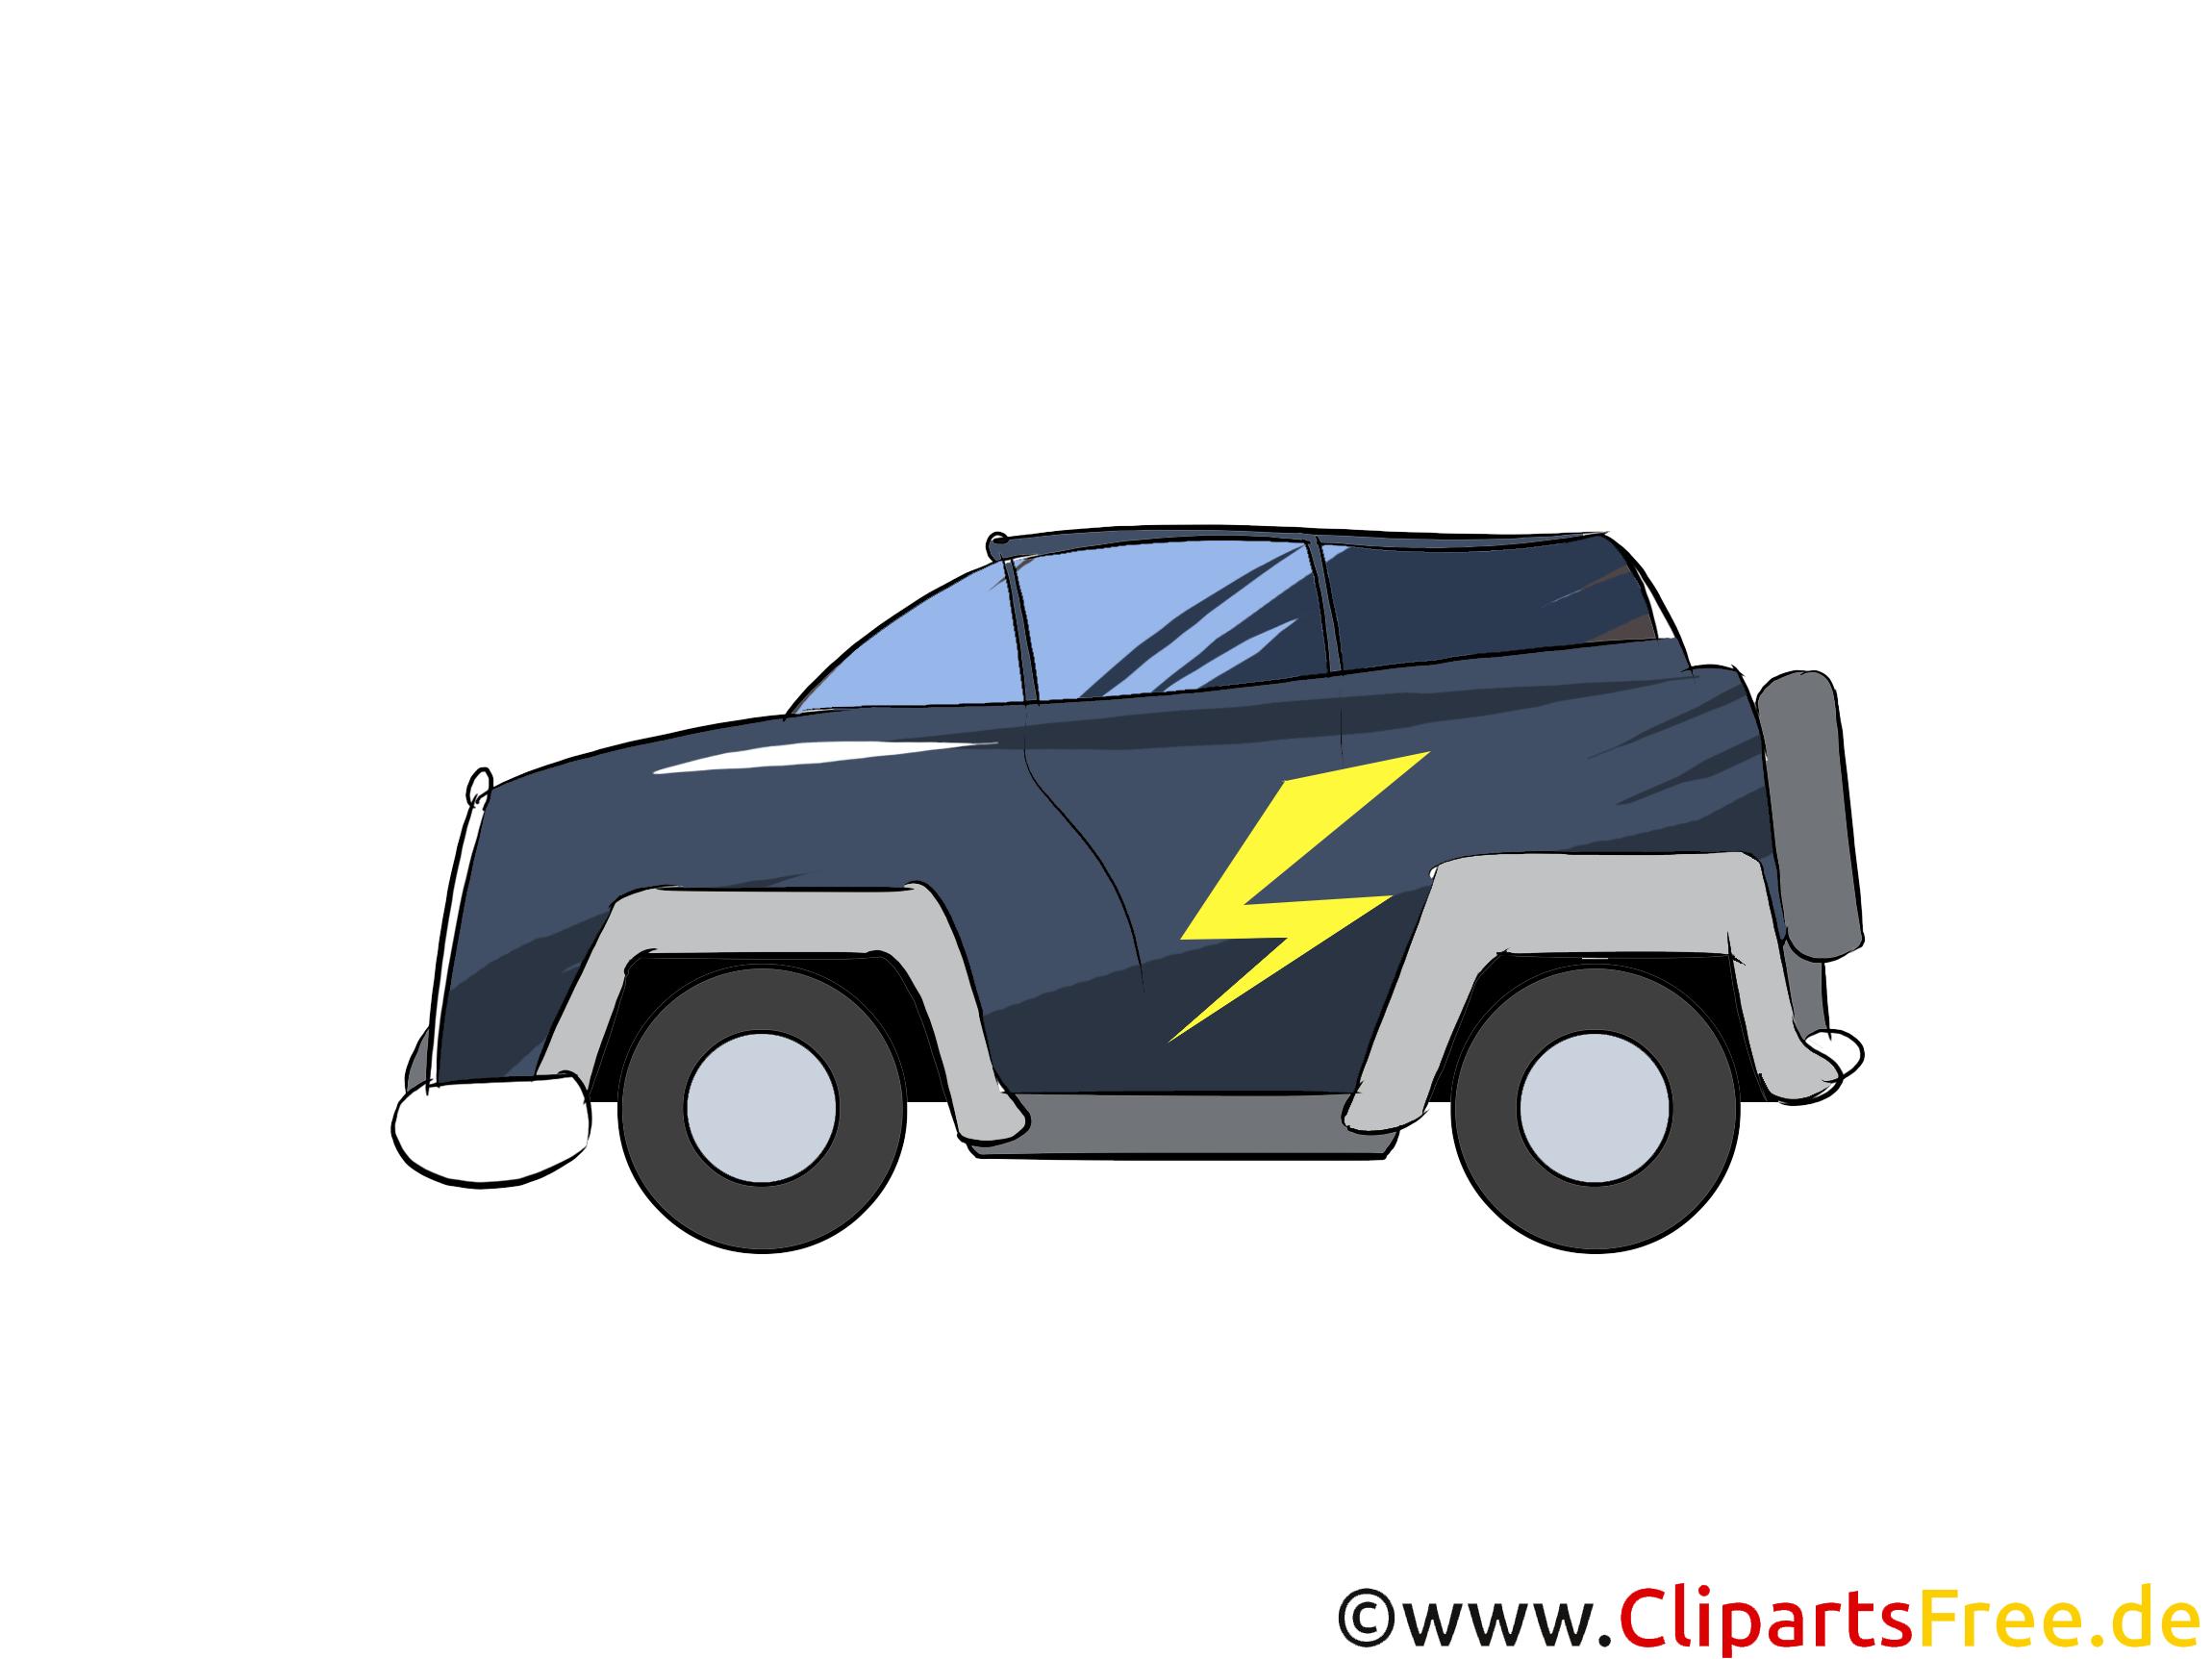 SUV als Elektroauto Clipart, Bild, Grafik